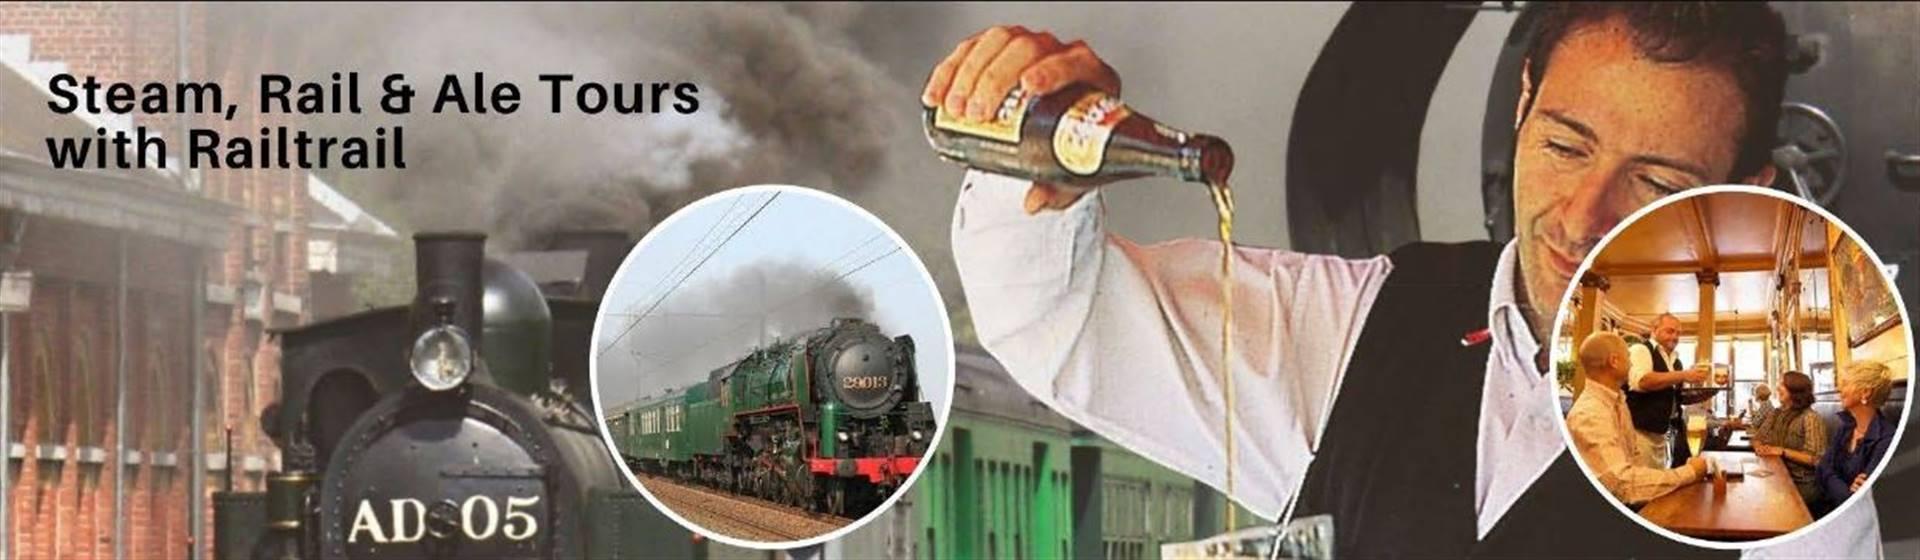 "<img src=""steamrail&ale.jpeg"" alt=""Steam, Rail & Ale Trails""/>"